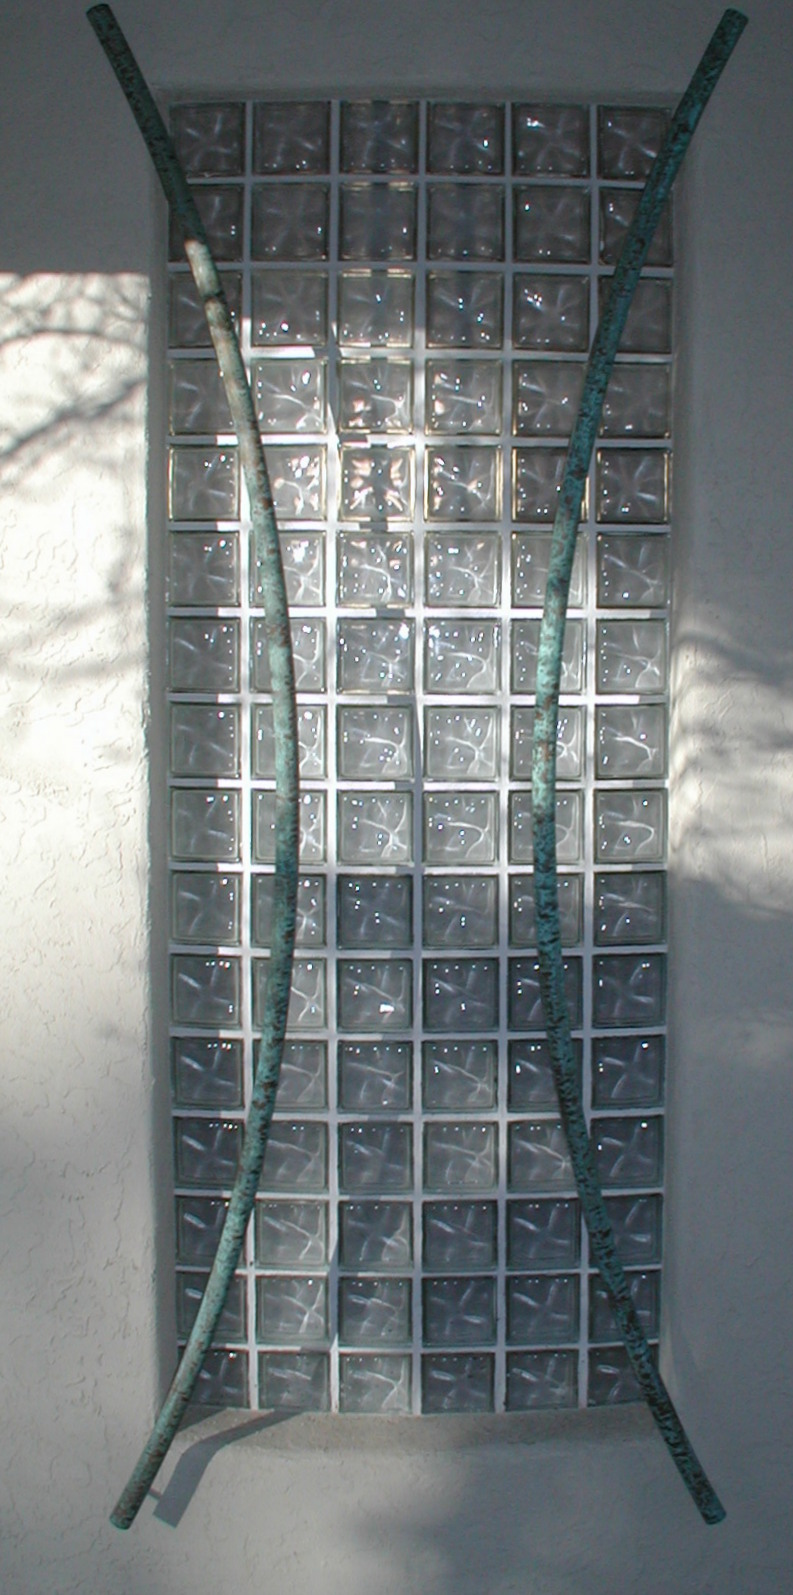 Bolane Exterior Copper Pipes 11 better.JPG